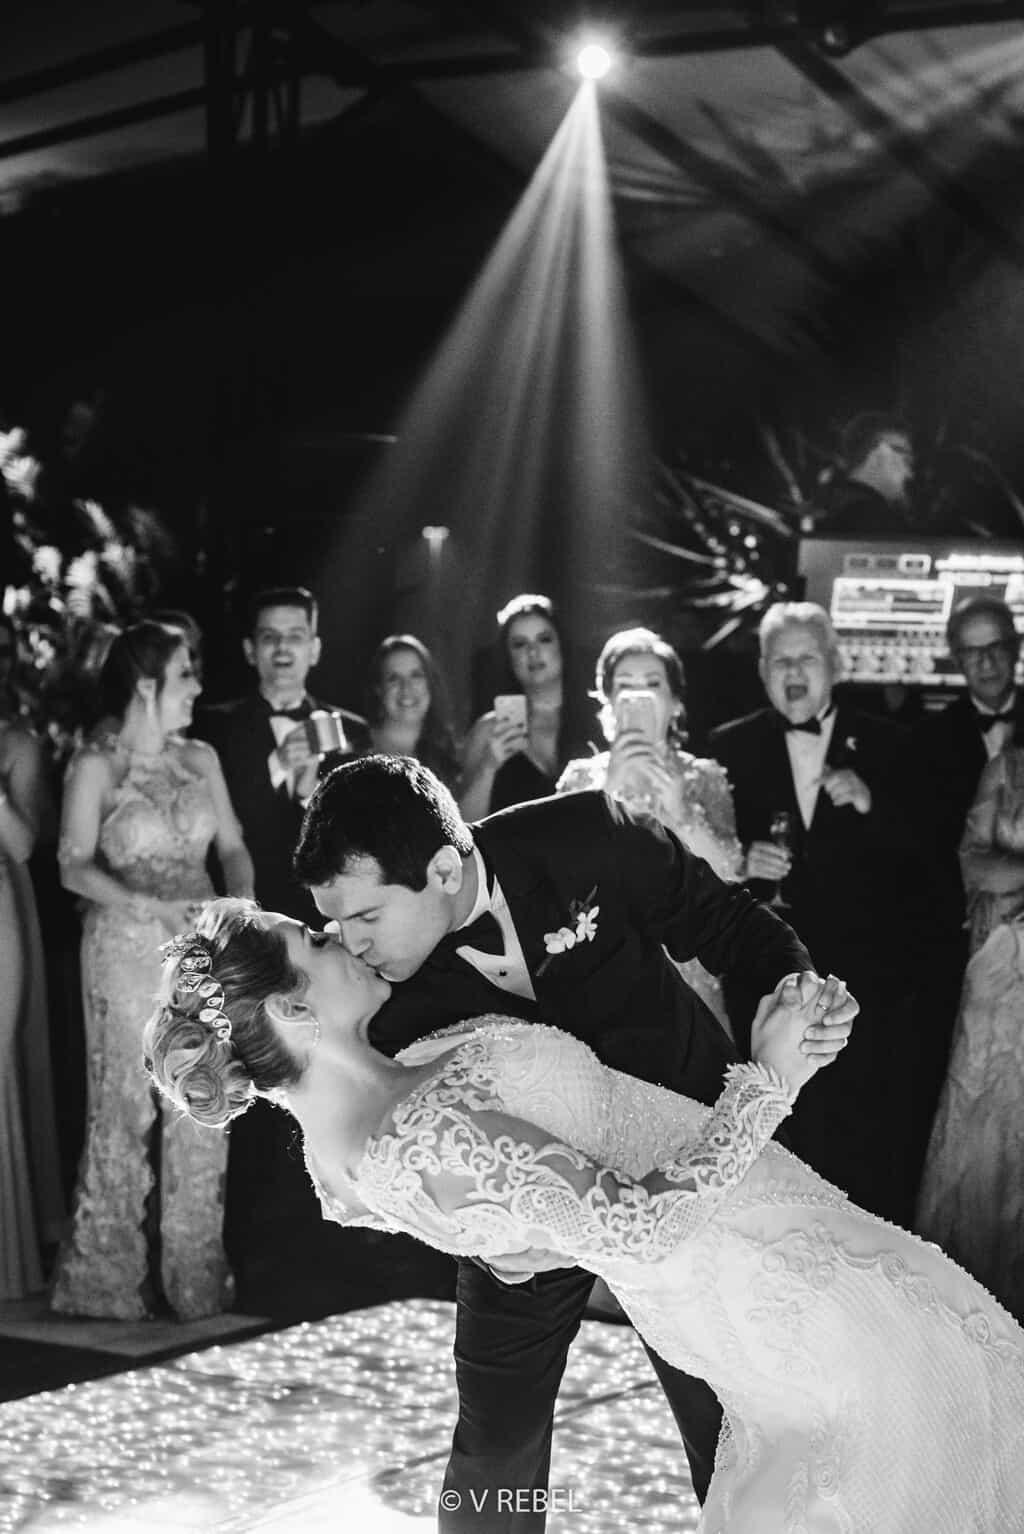 casamento-Caroline-e-Breno-casamento-clássico-fotografia-VRebel-noivos-na-pista-pista89